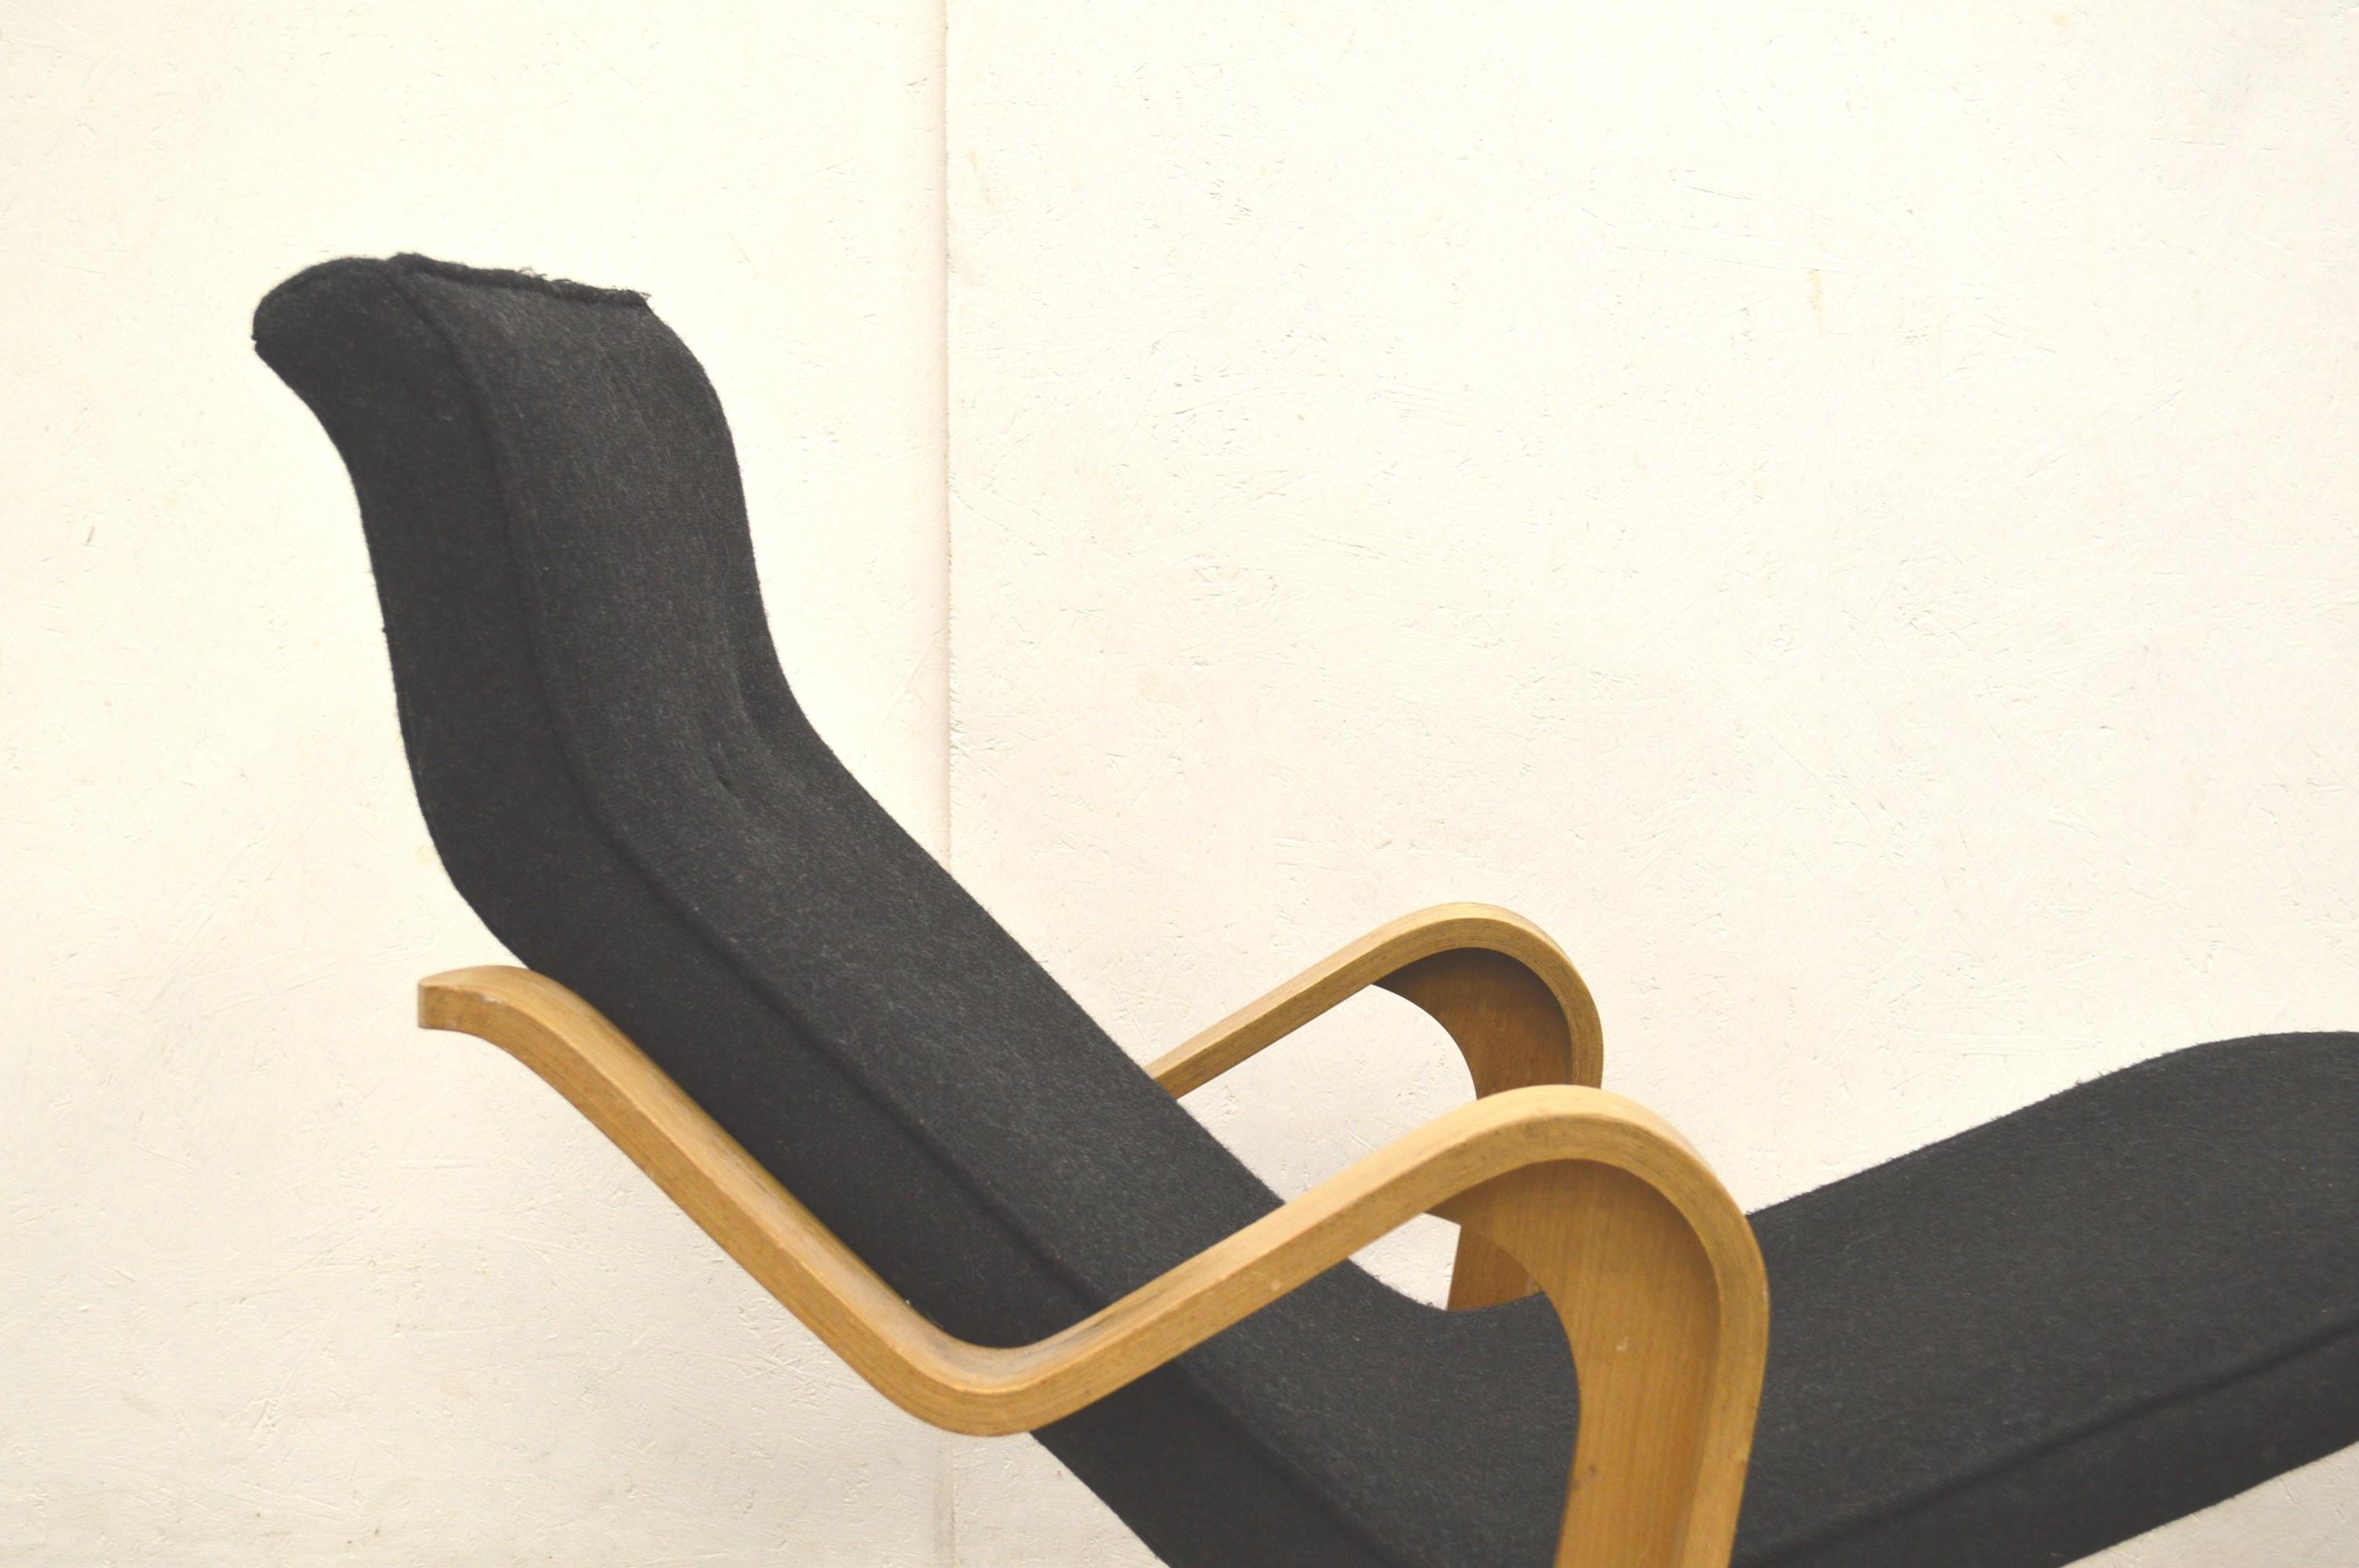 Vintage Black Chaise Longue By Marcel Breuer For Isokon